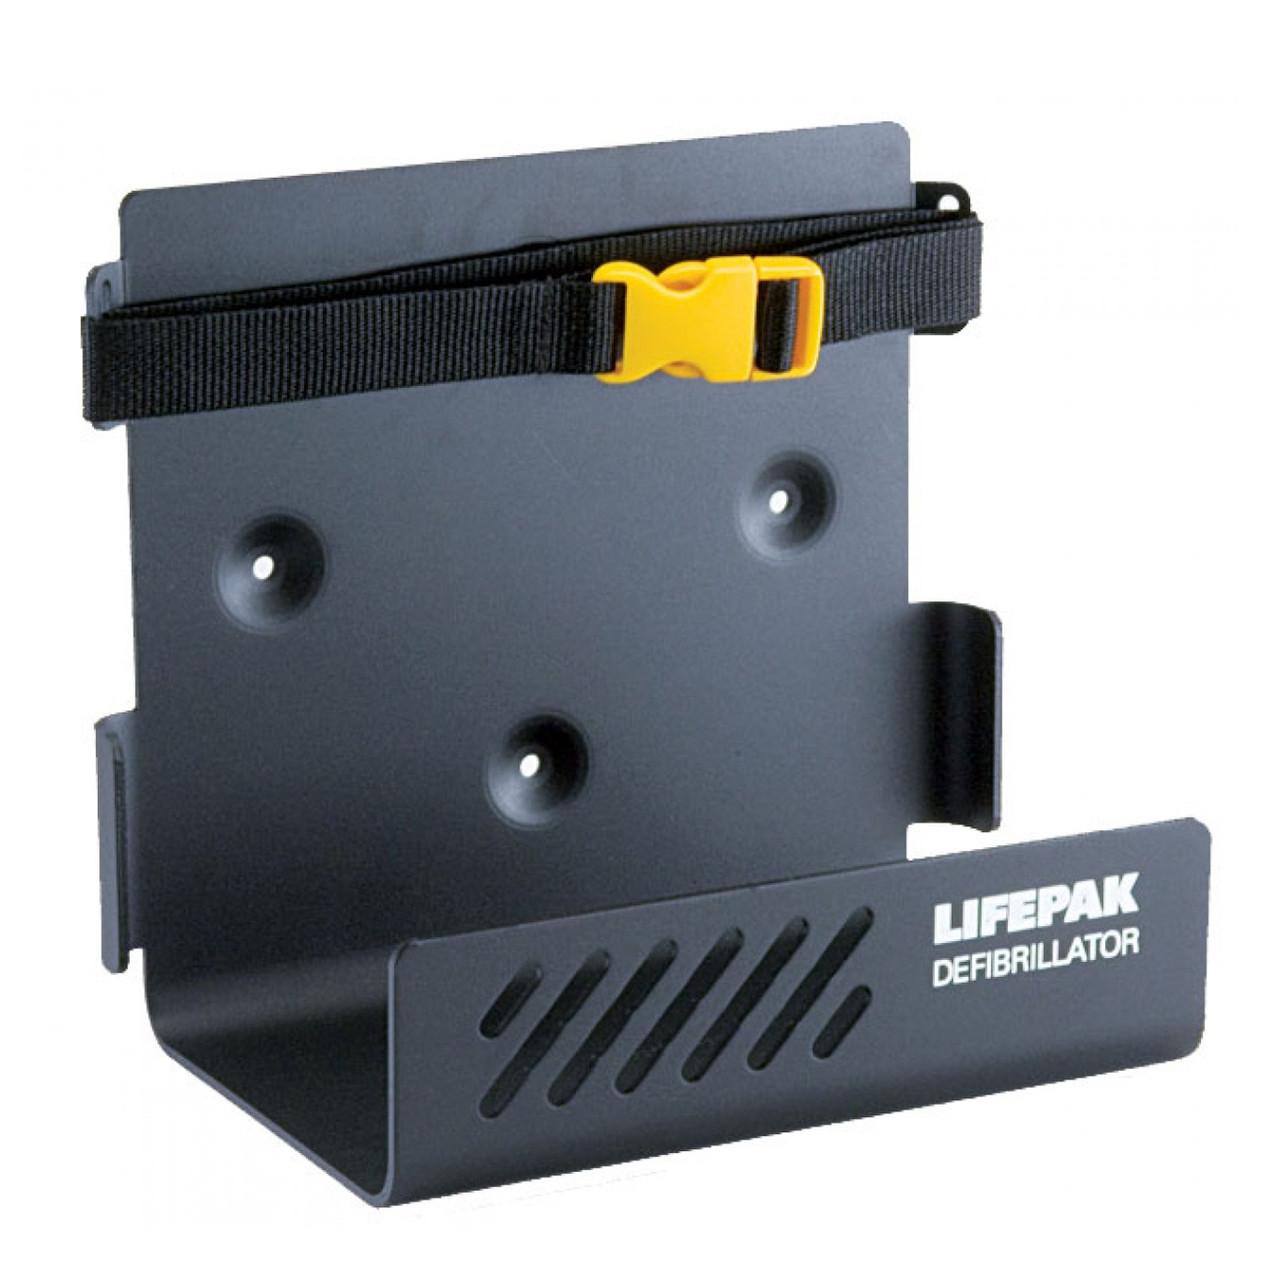 Physio-Control Wall Mount Bracket for LIFEPAK® 1000 or LIFEPAK 500 defibrillators